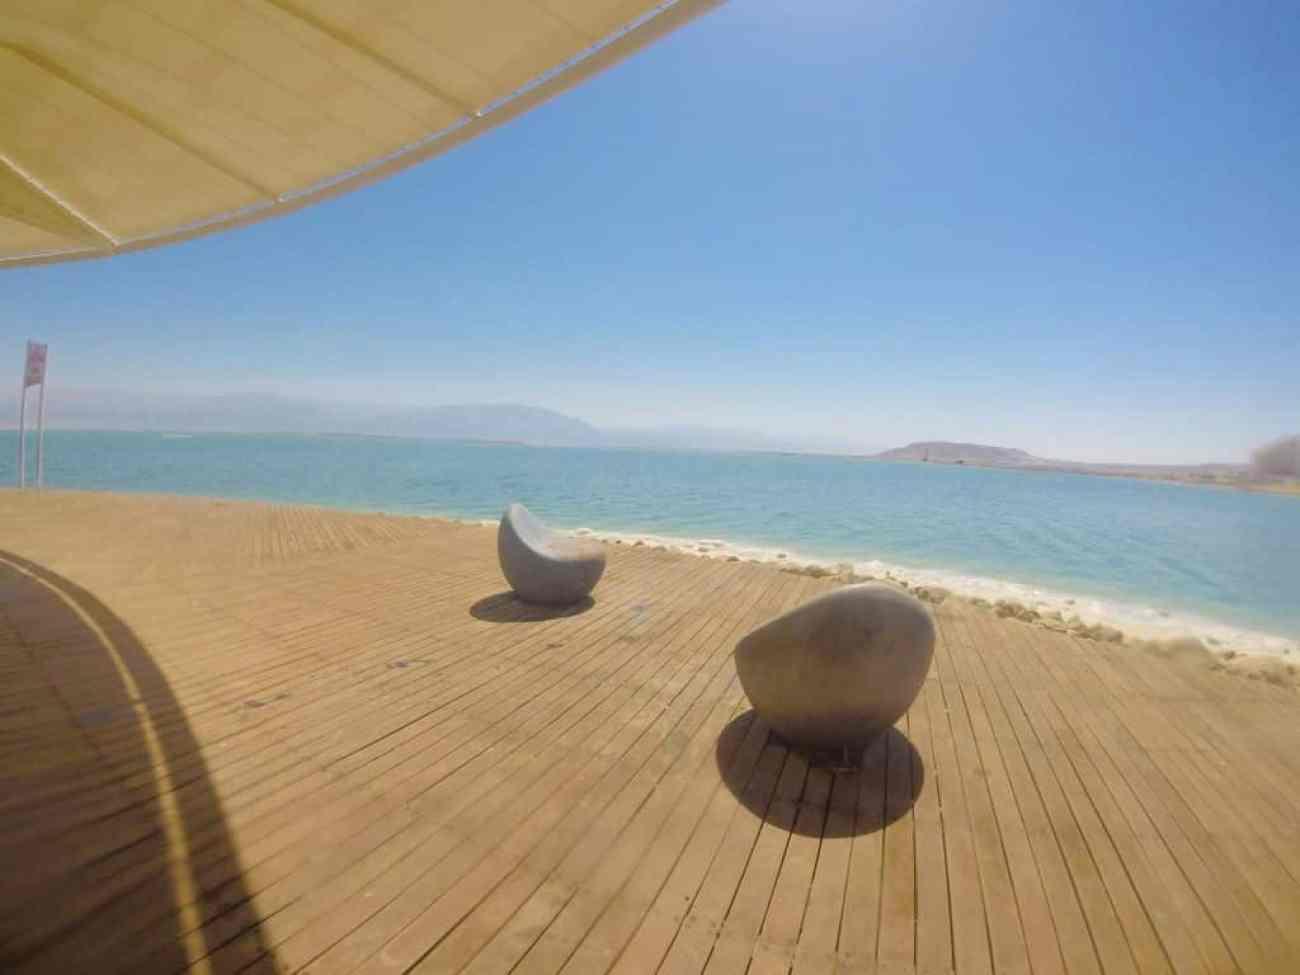 Guide to Swimming in the Dead Sea